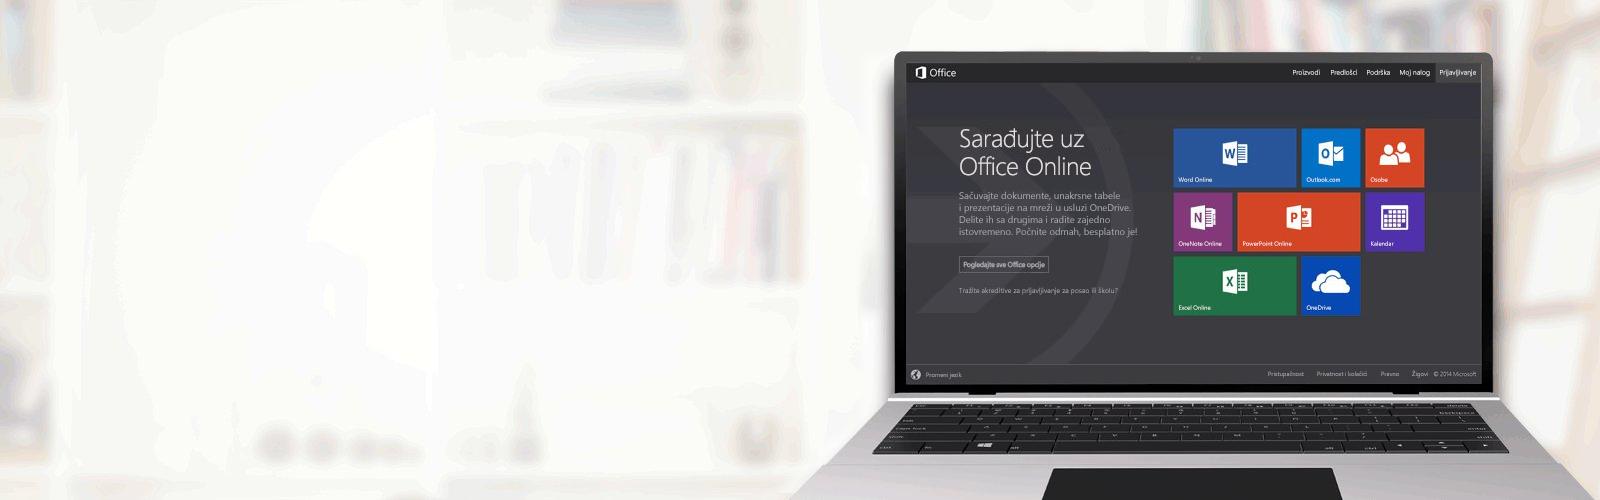 Sarađujte uz Office Online